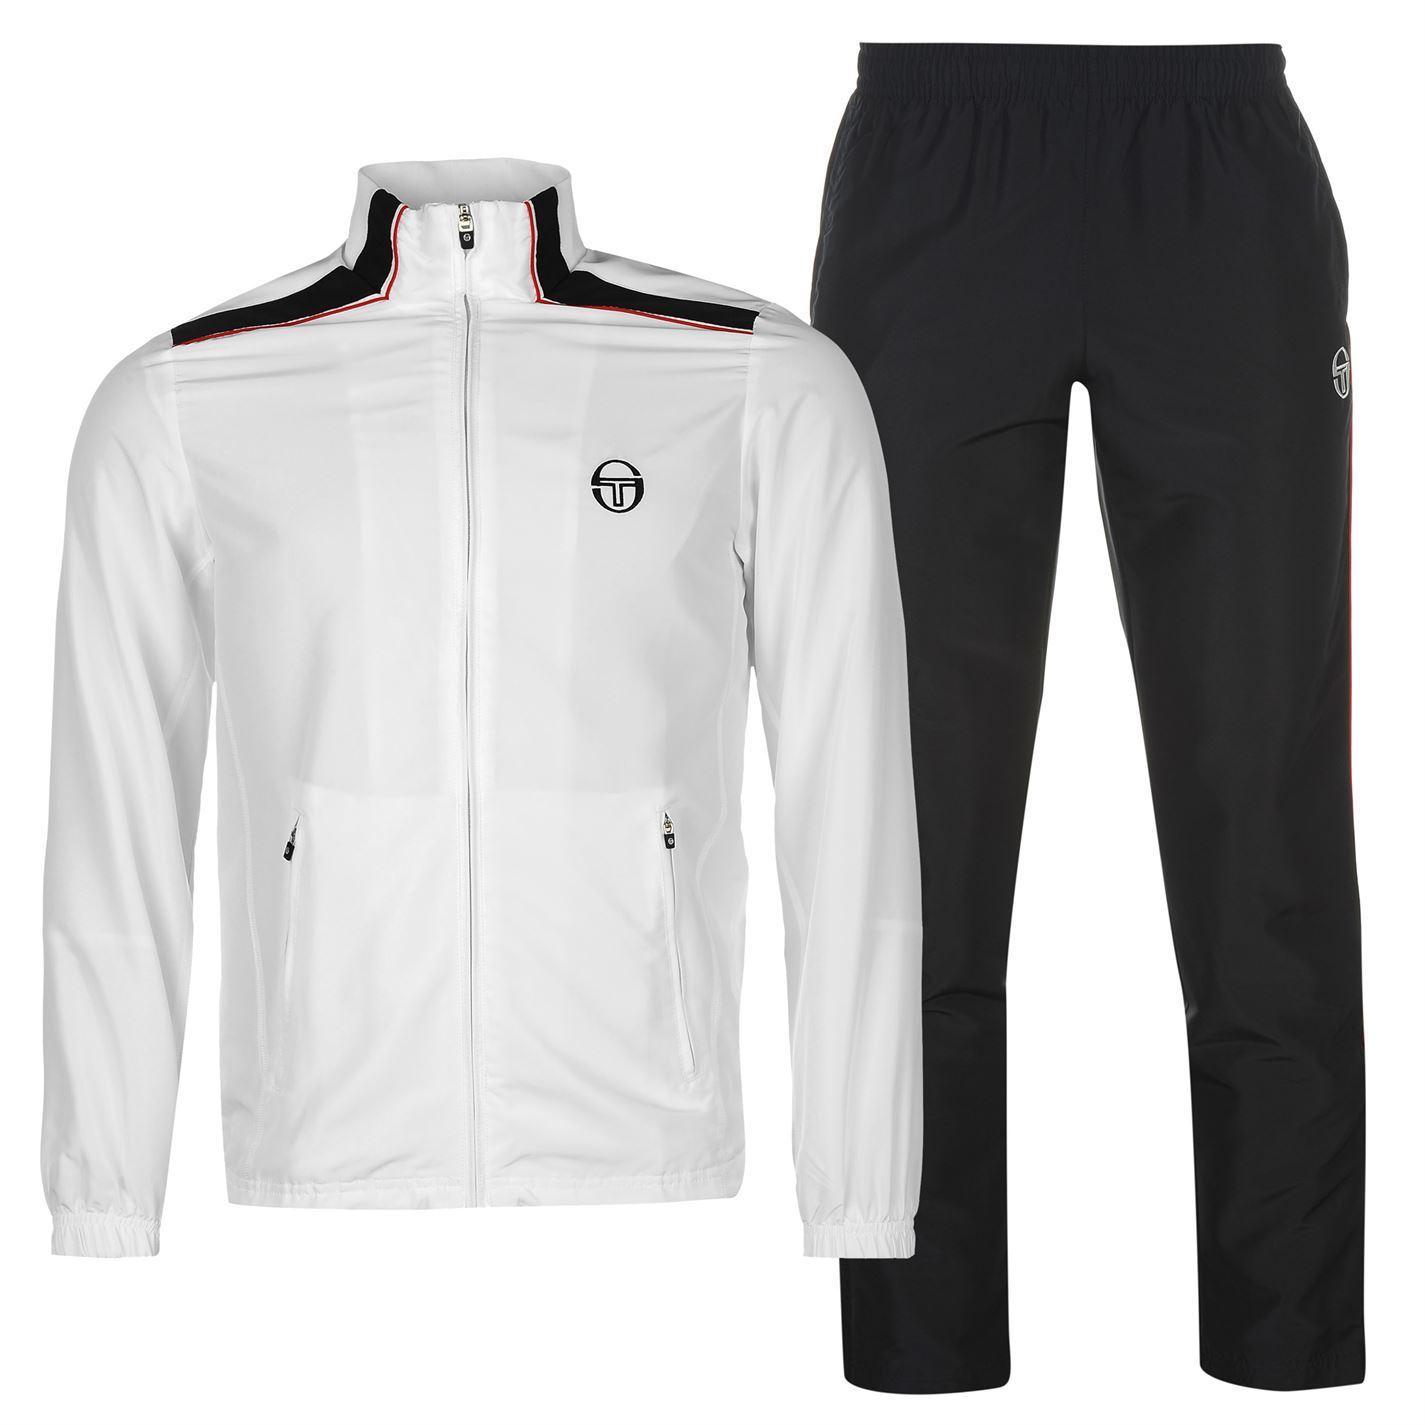 7d0c034ee9 Sergio Tacchini Mens Tuta Tracksuit Long Sleeve Full Zip Top Sports ...